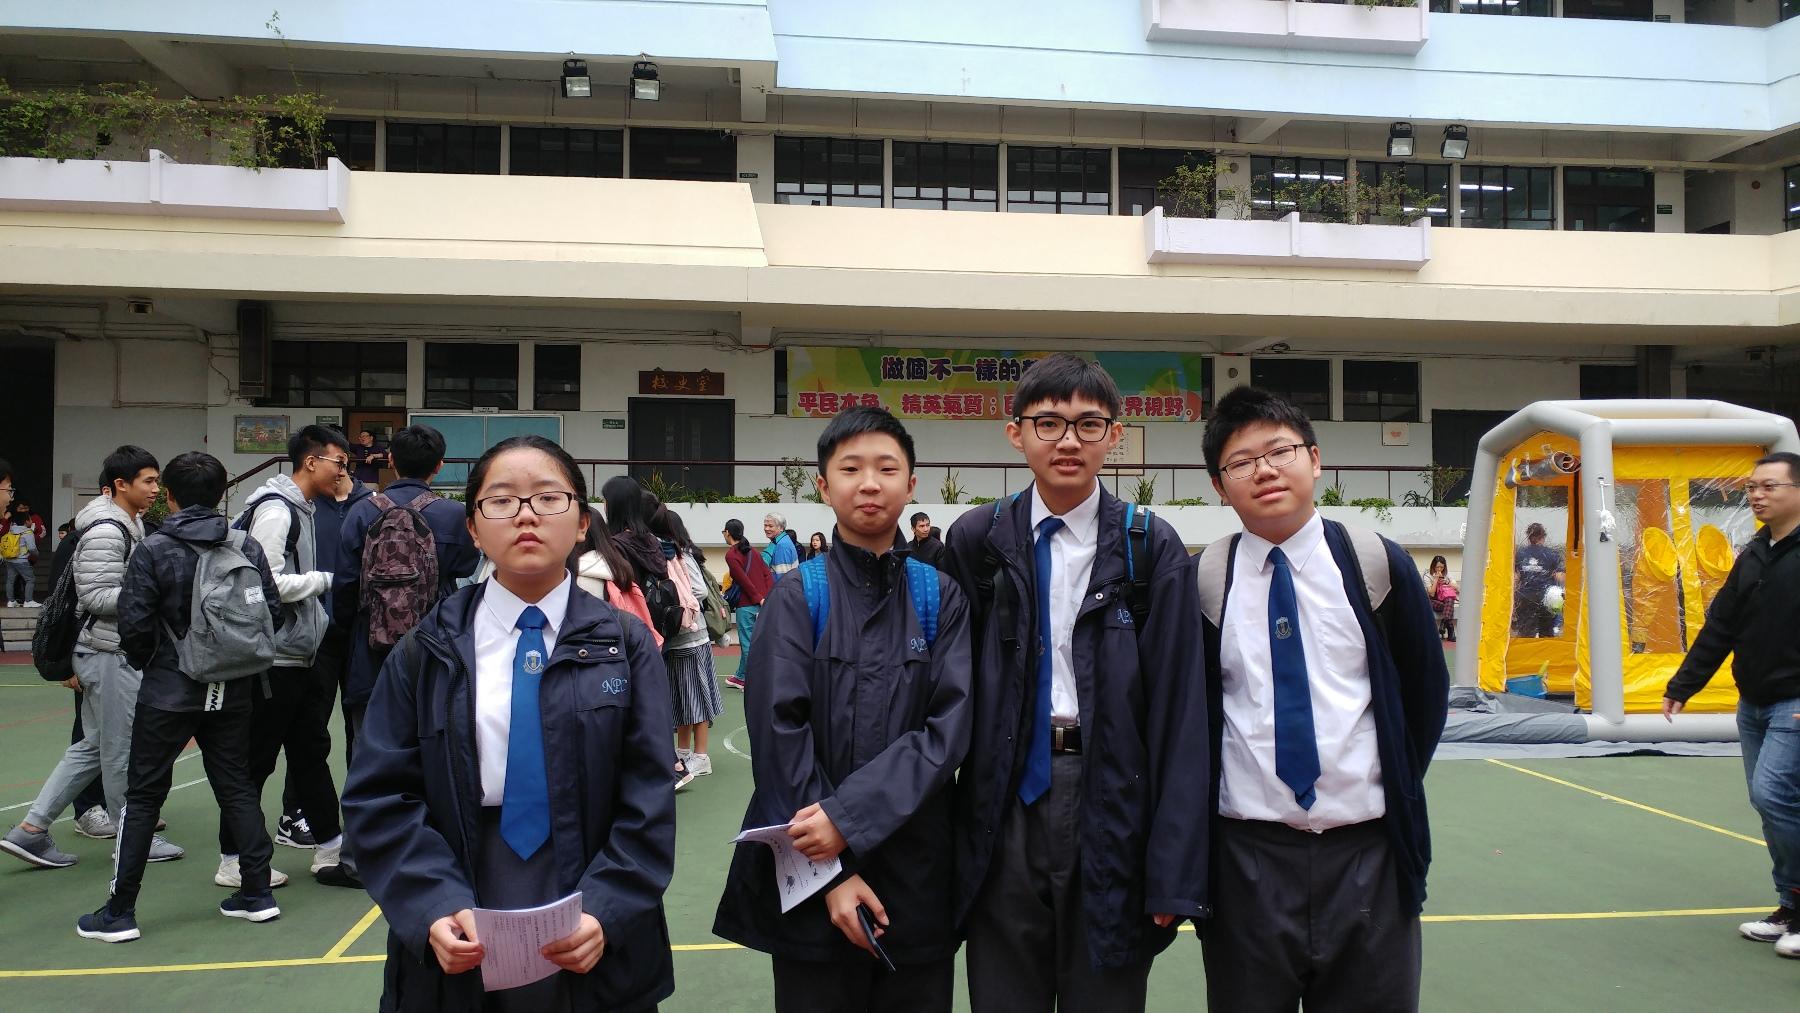 http://npc.edu.hk/sites/default/files/20181216_3.jpg